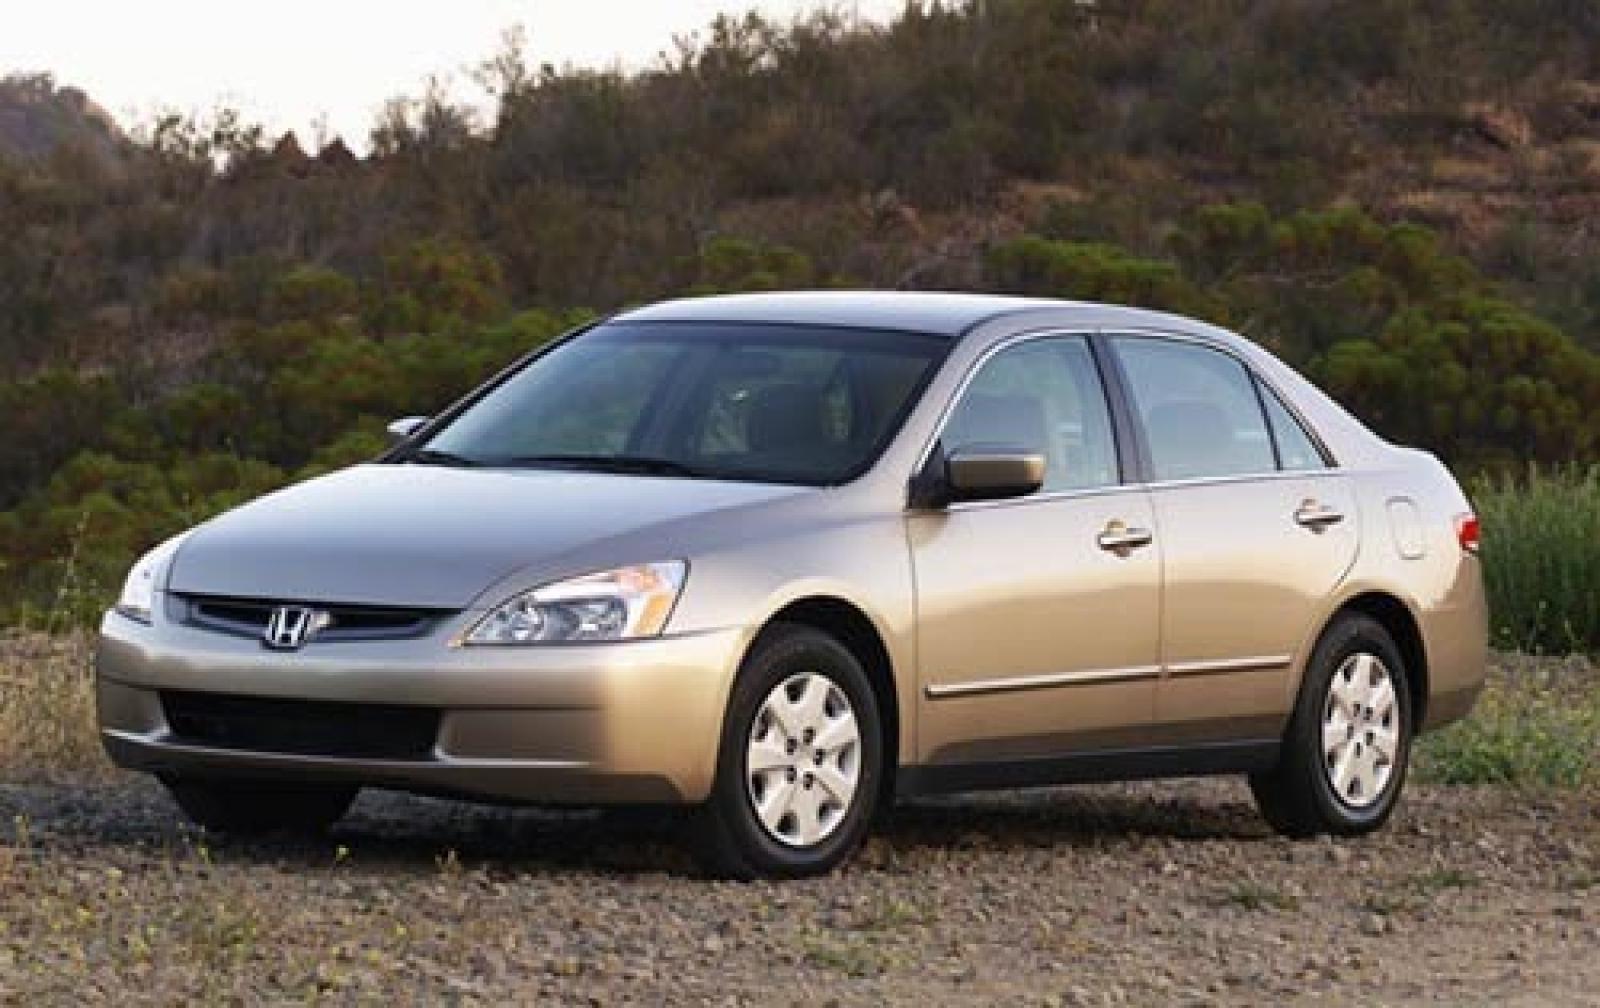 2005 Honda Accord 6